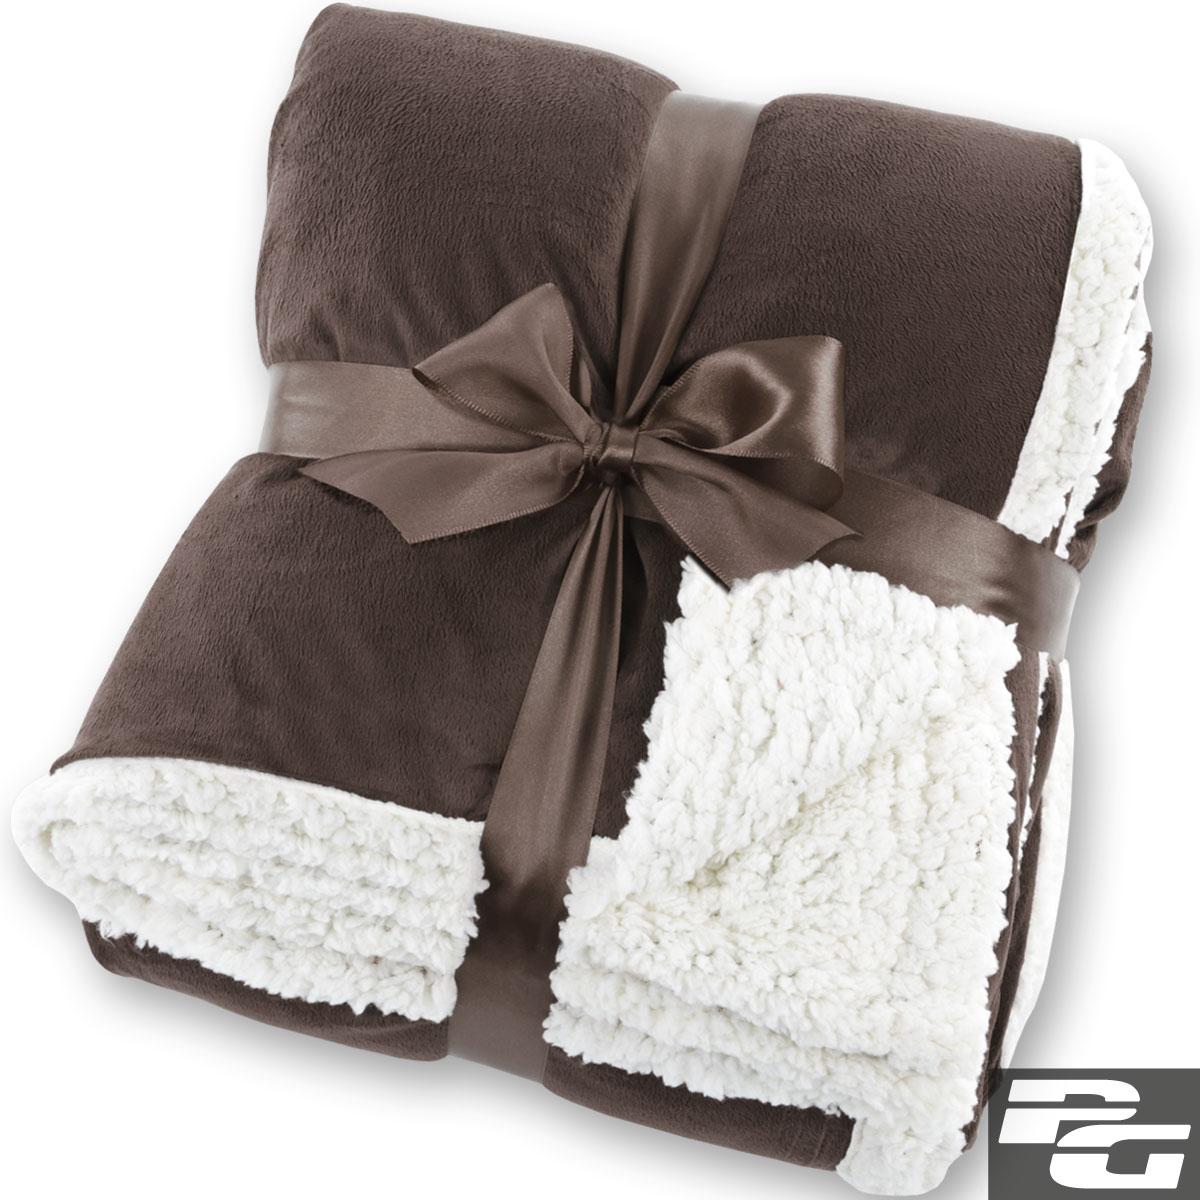 xxl kuscheldecke 220 x 220 cm lammfelloptik tagesdecke wohndecke plaid decke ebay. Black Bedroom Furniture Sets. Home Design Ideas